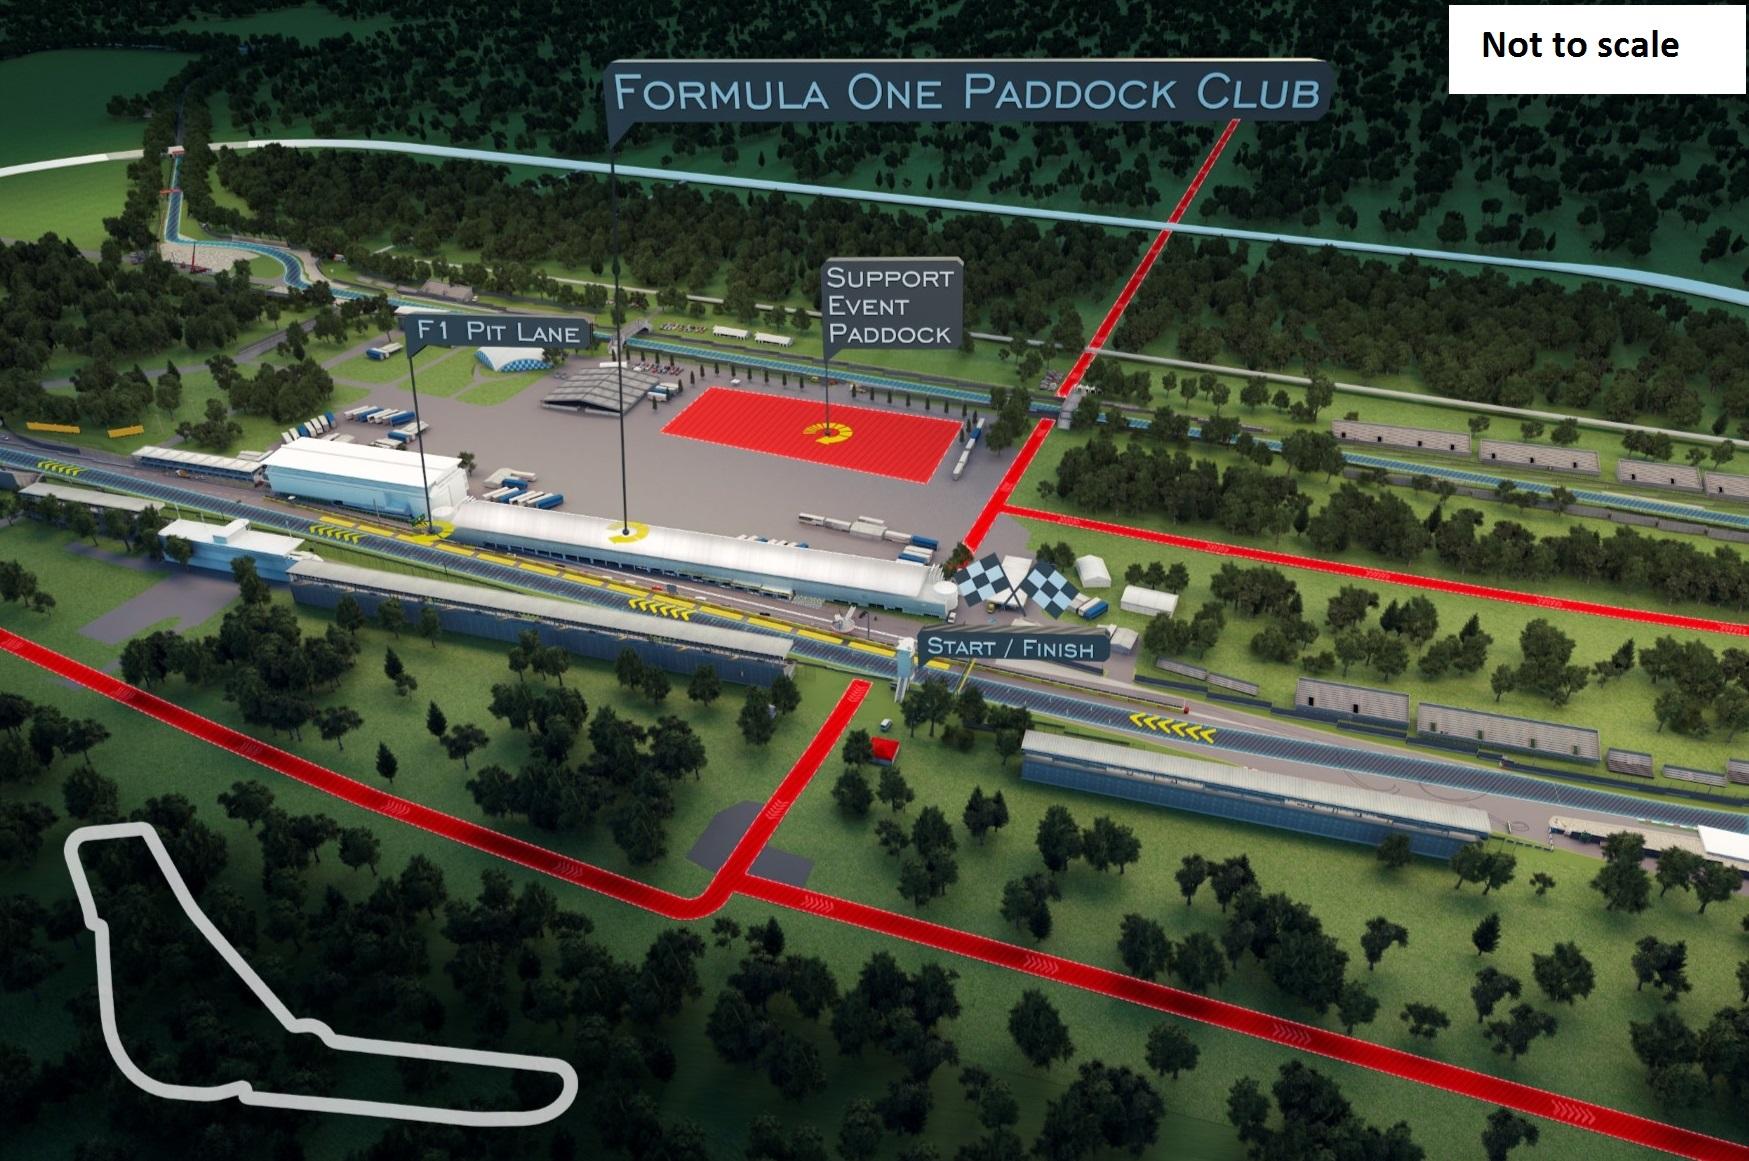 monza italian f1 grand prix vip paddock club pit walk hospitality 2018 the hospitality. Black Bedroom Furniture Sets. Home Design Ideas